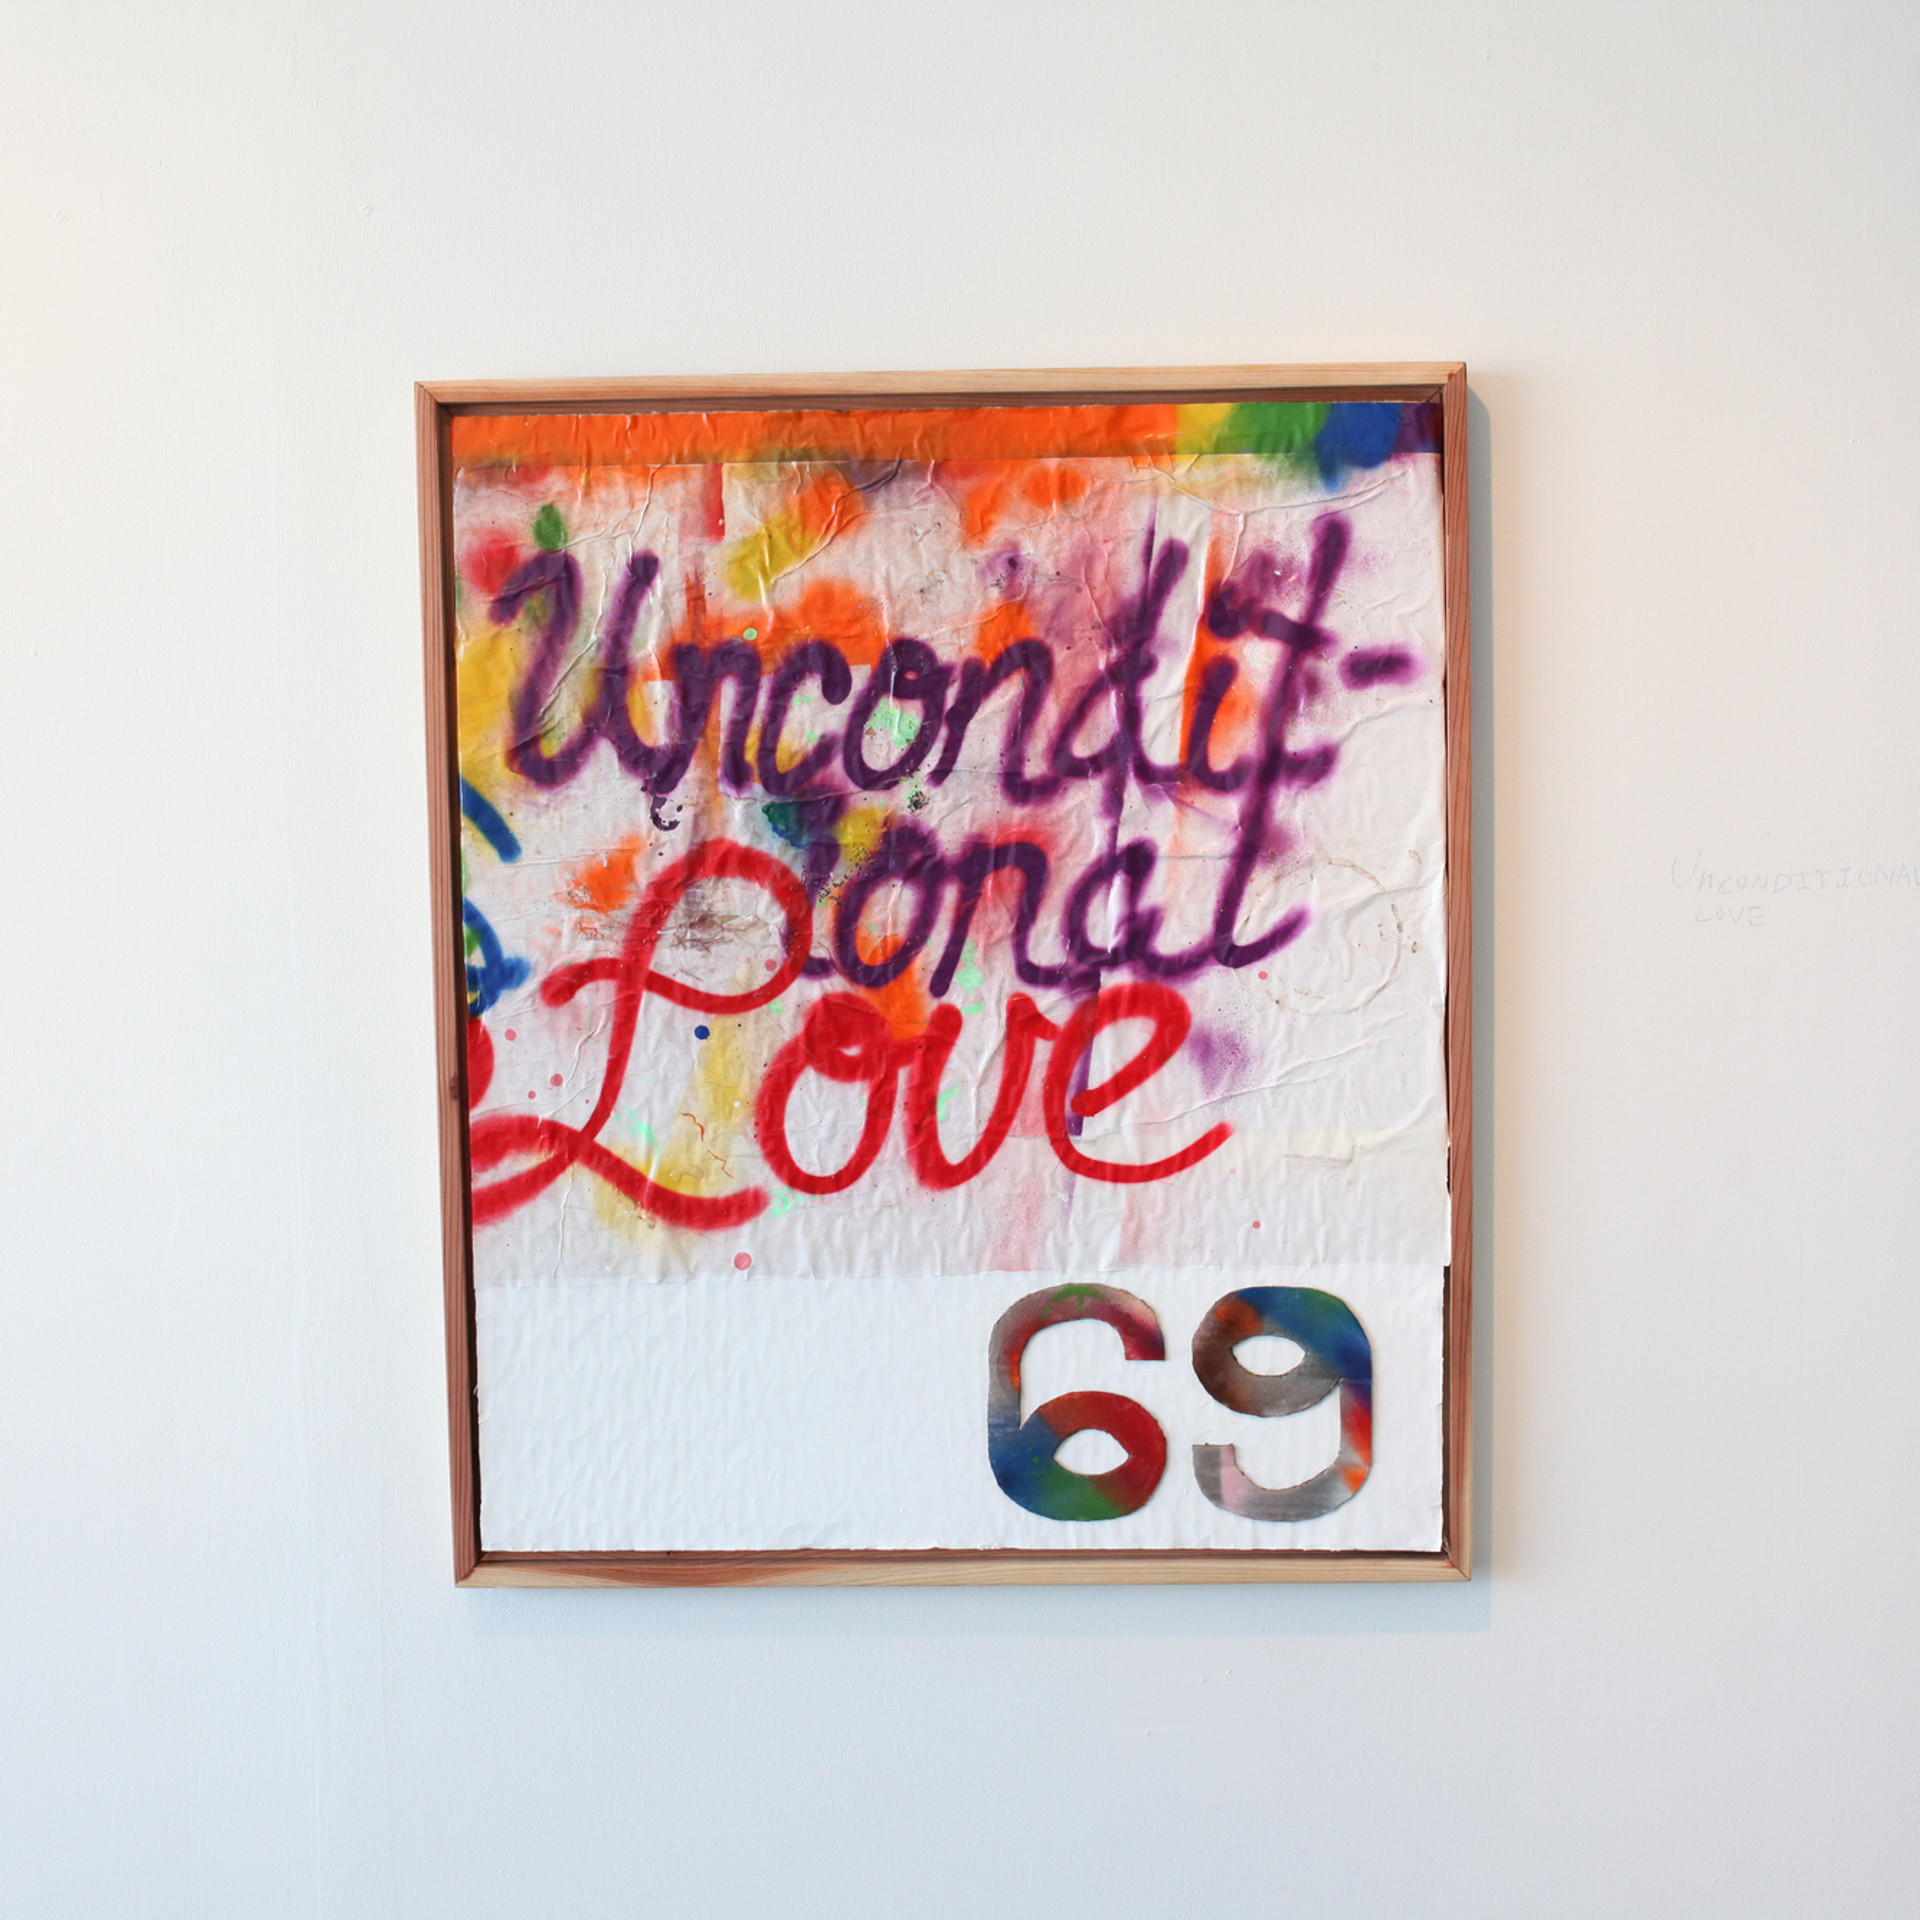 Uncoditional Love, 2019